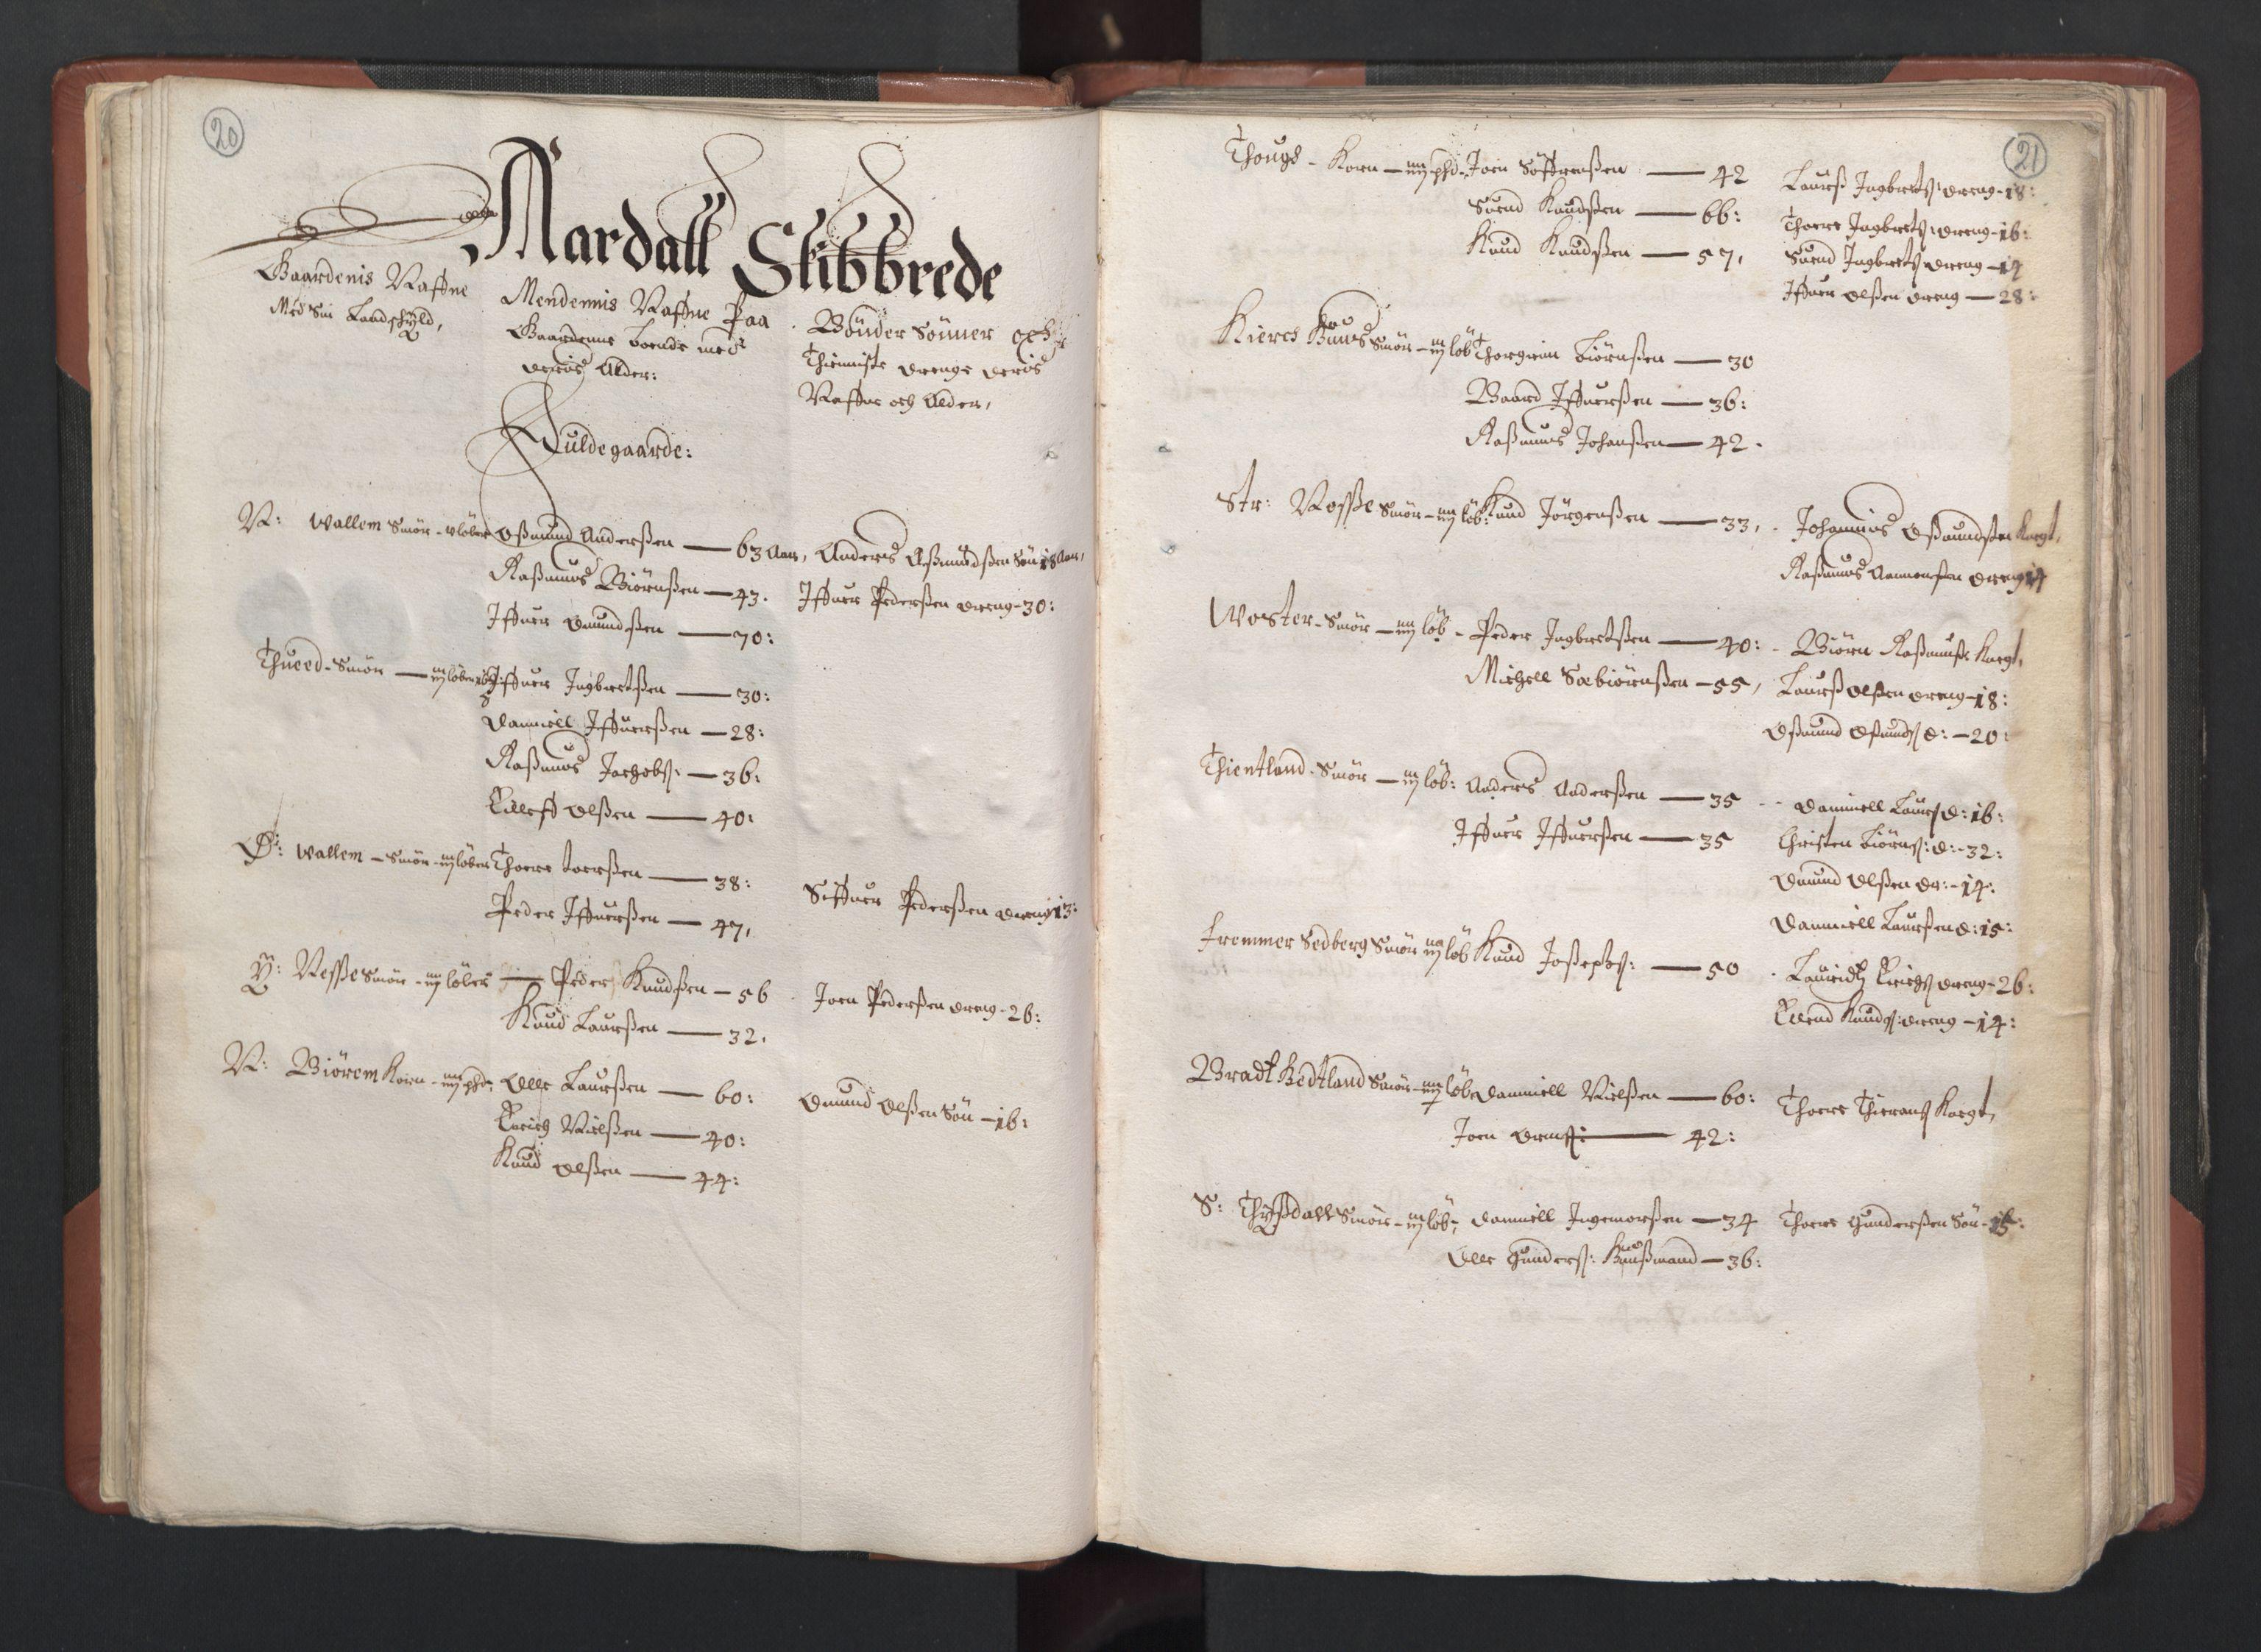 RA, Fogdenes og sorenskrivernes manntall 1664-1666, nr. 12: Ryfylke fogderi, 1664, s. 20-21